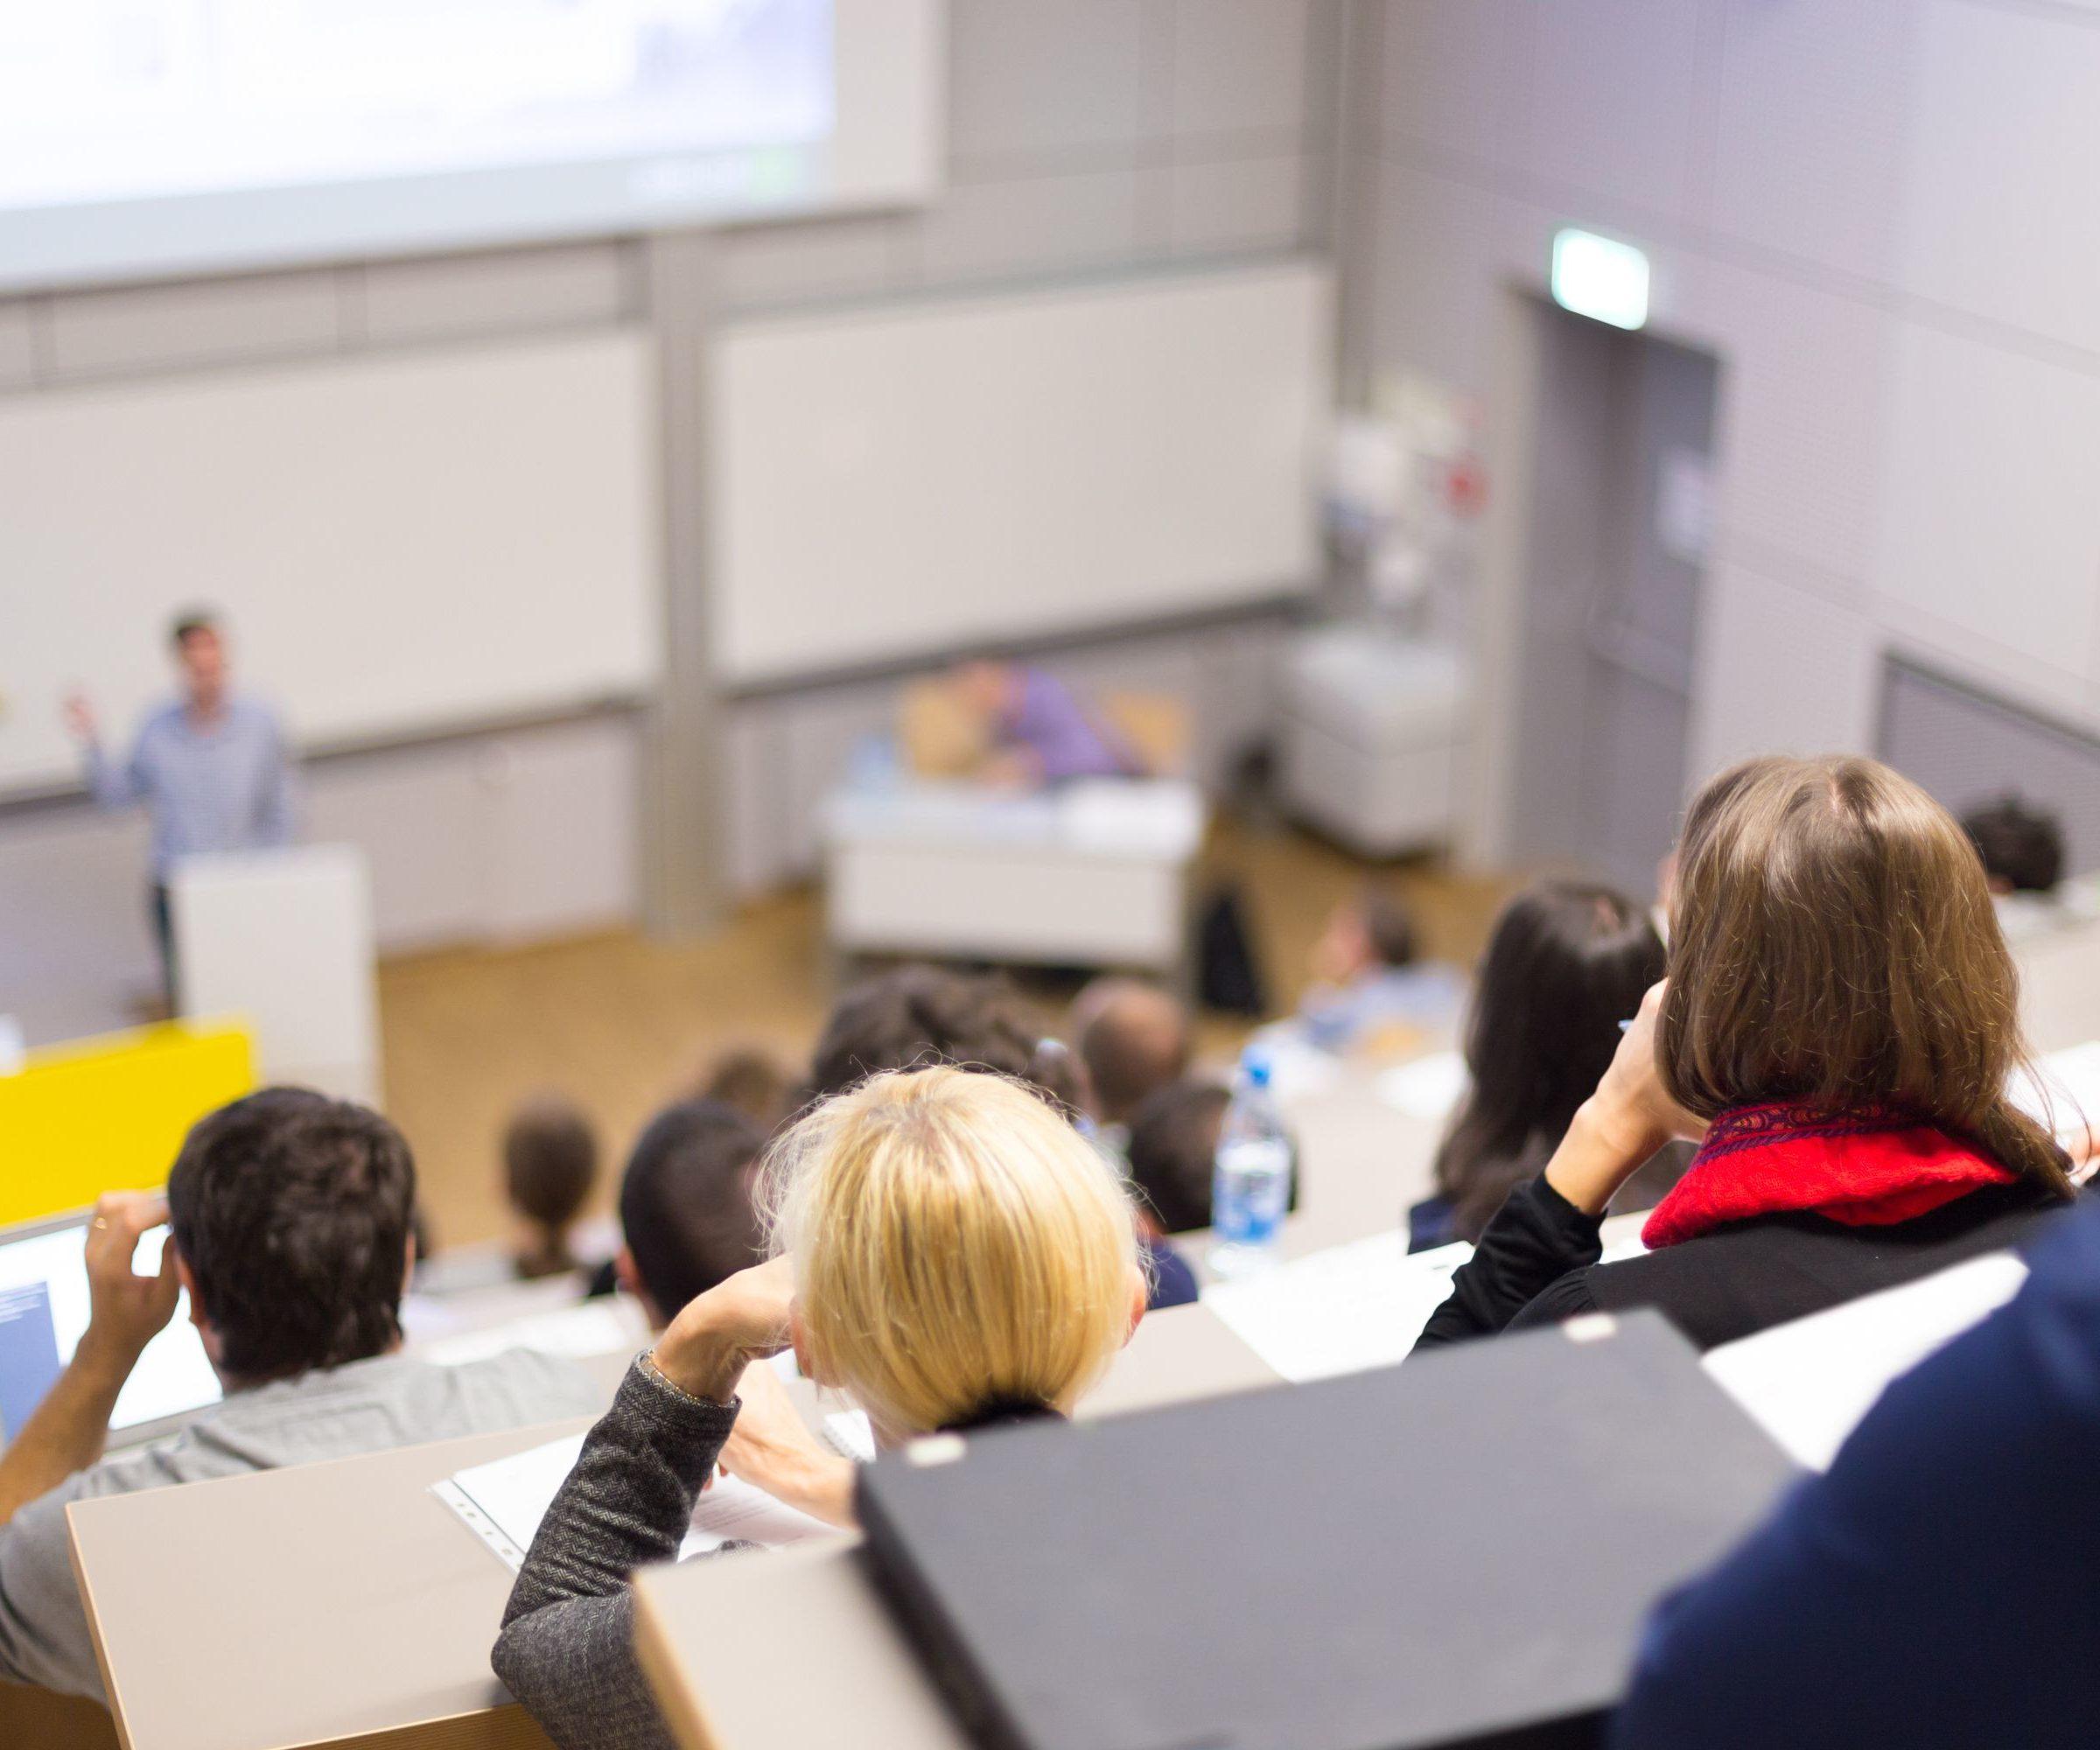 Learning Training University School